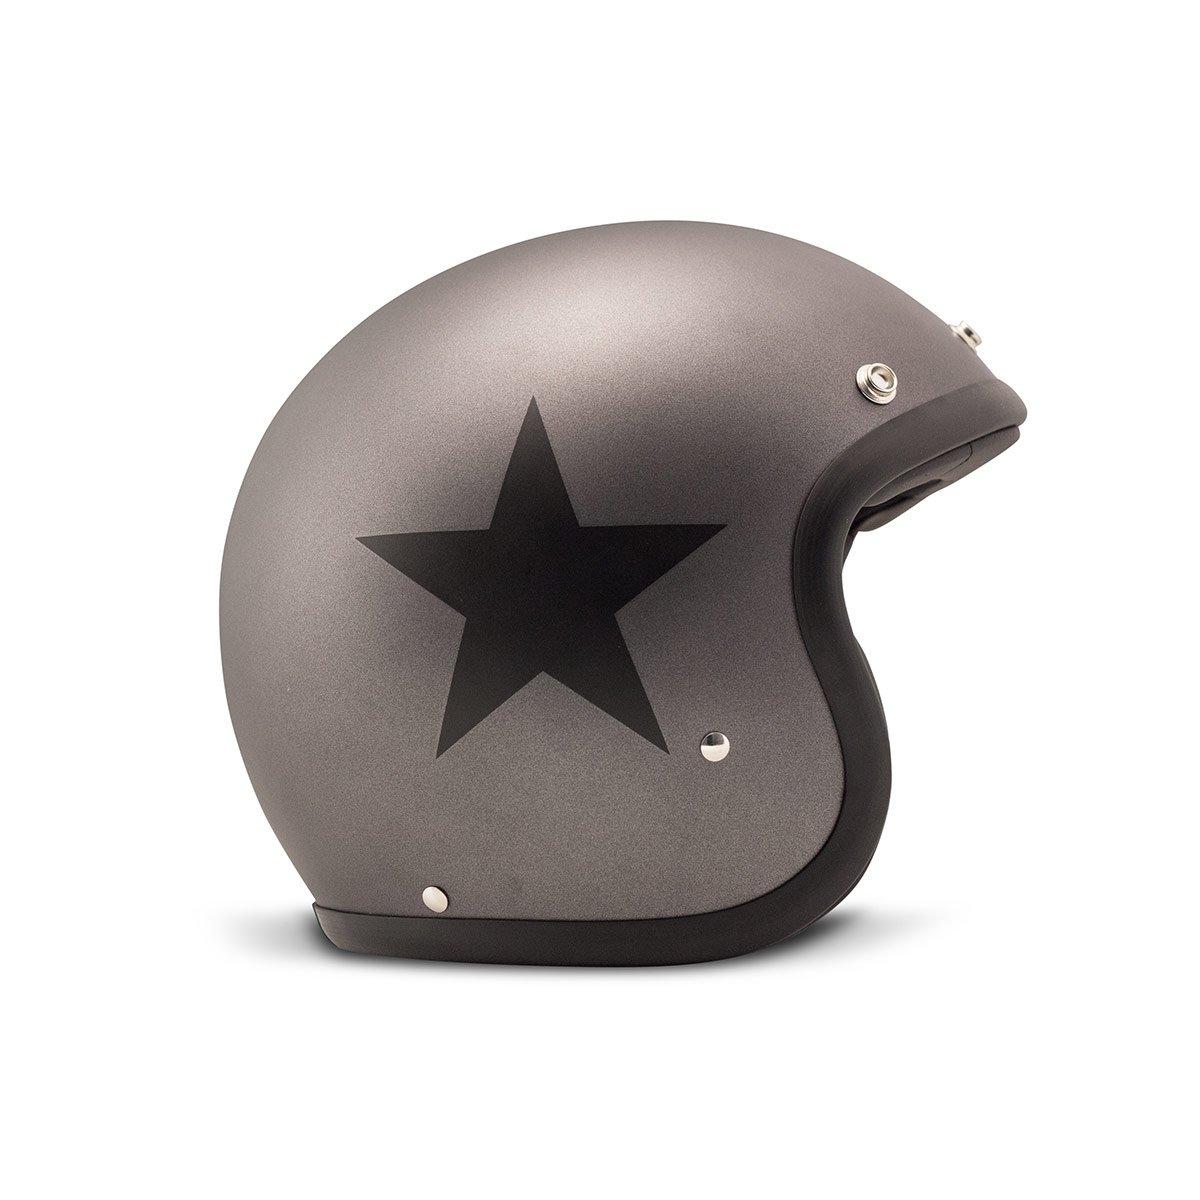 DMD 1jts30000sr01Helm Motorrad, Star grey, Größe XS